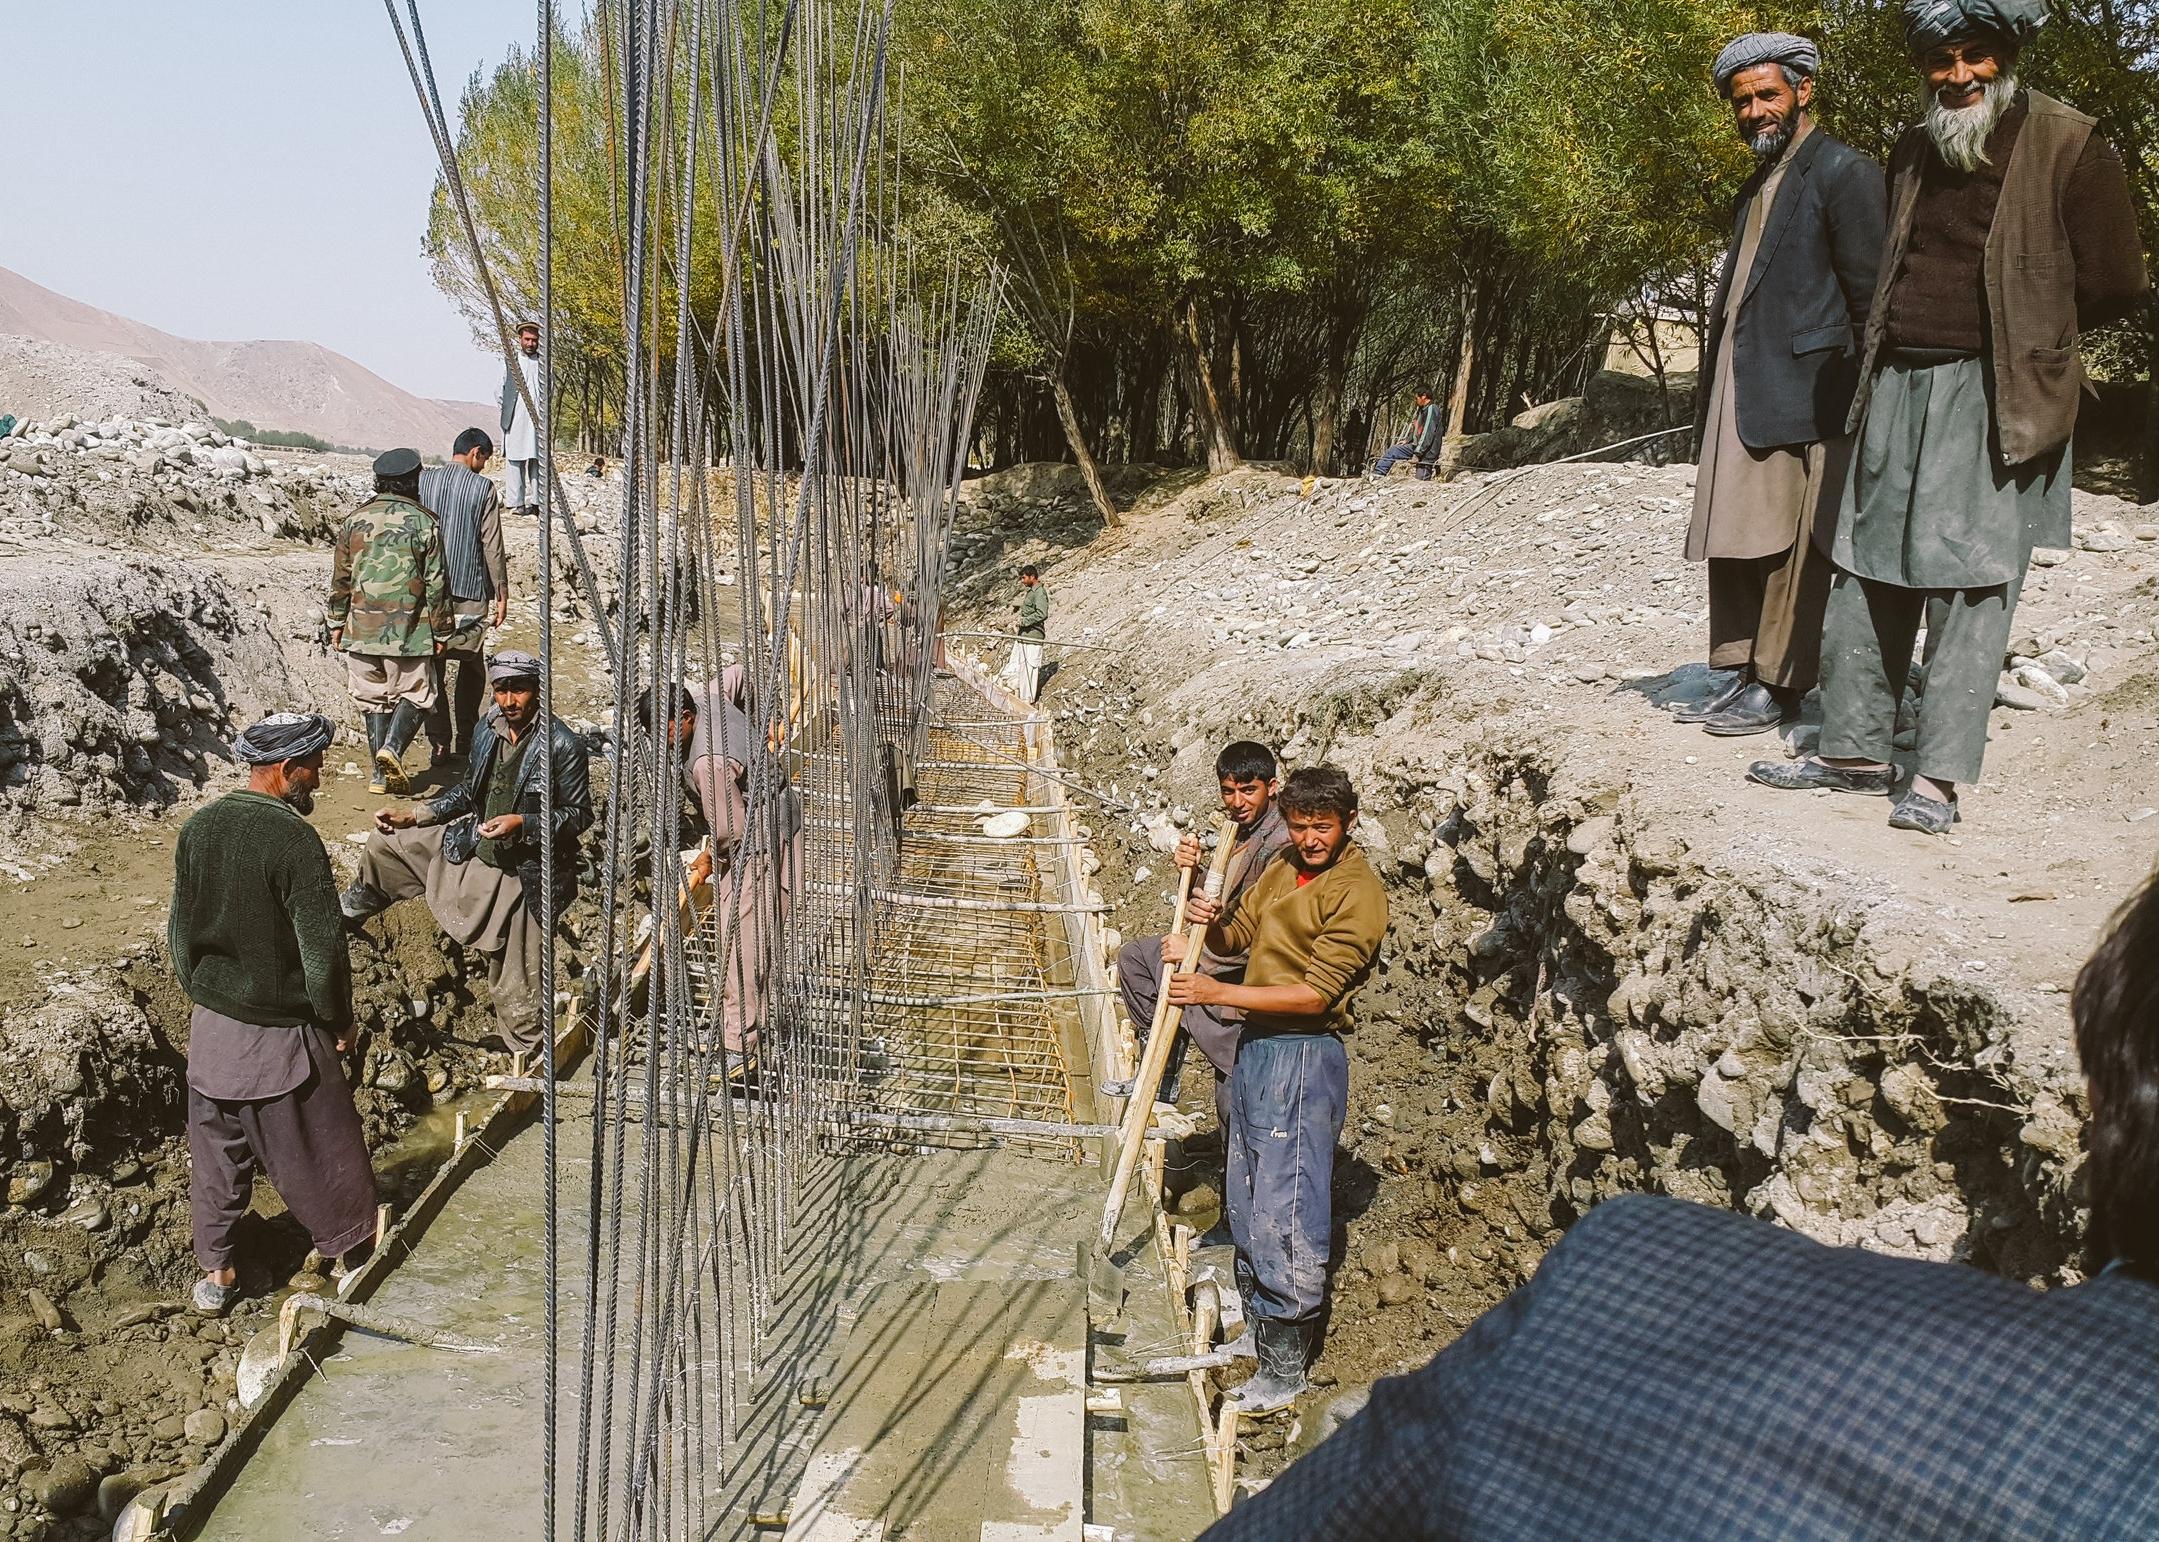 Working on irrigation infrastructure